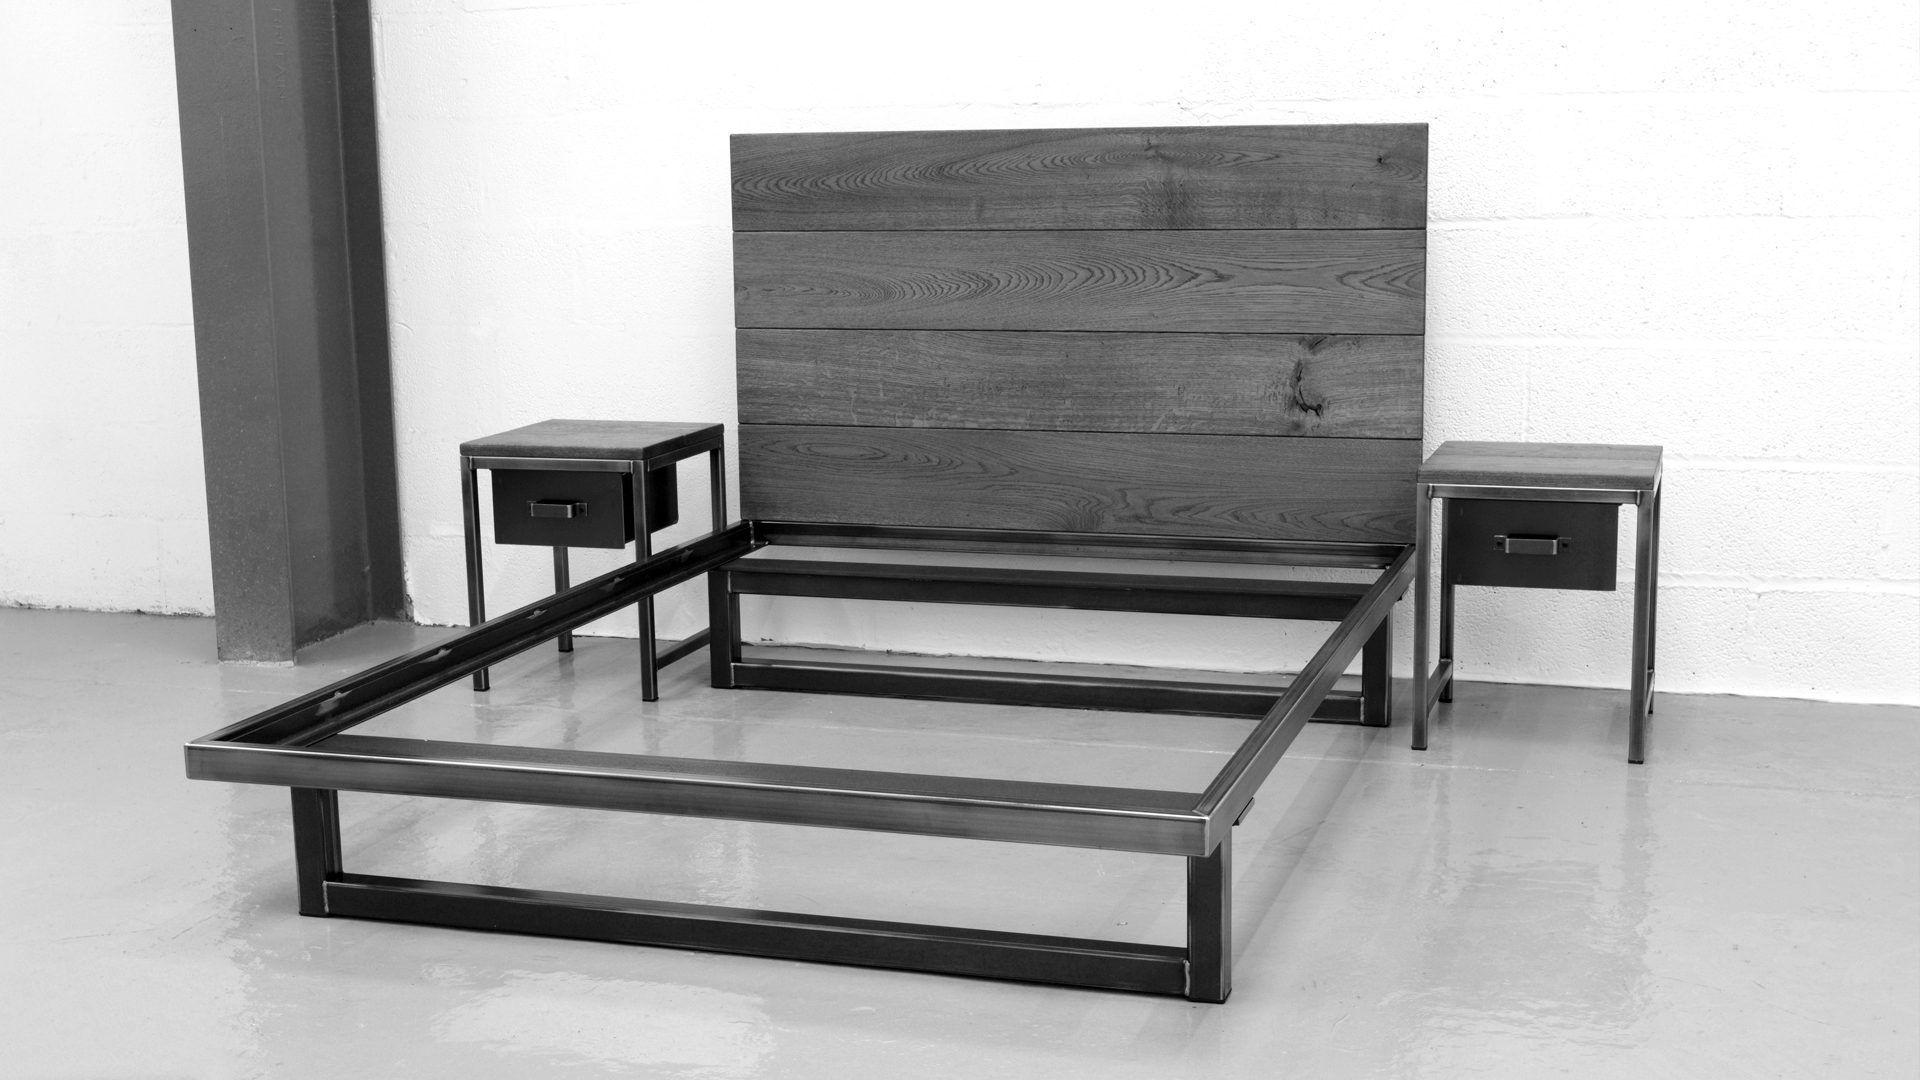 The blacksmith bed by steel vintage luxury handmade industrial